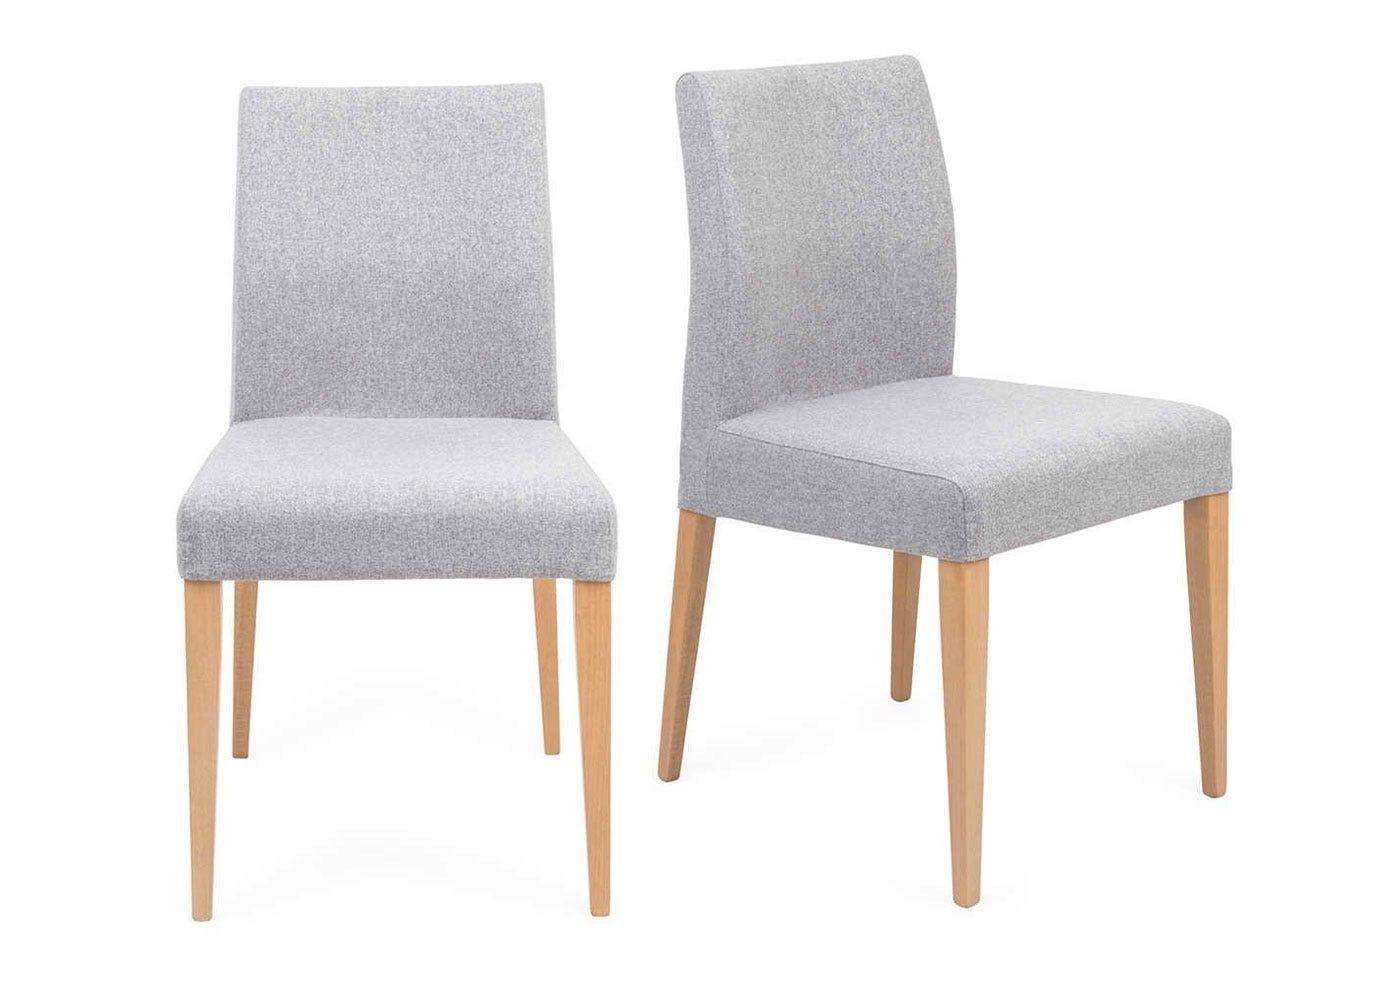 Hudson Pair of Dining Chairs Joshua Grey Natural Legs